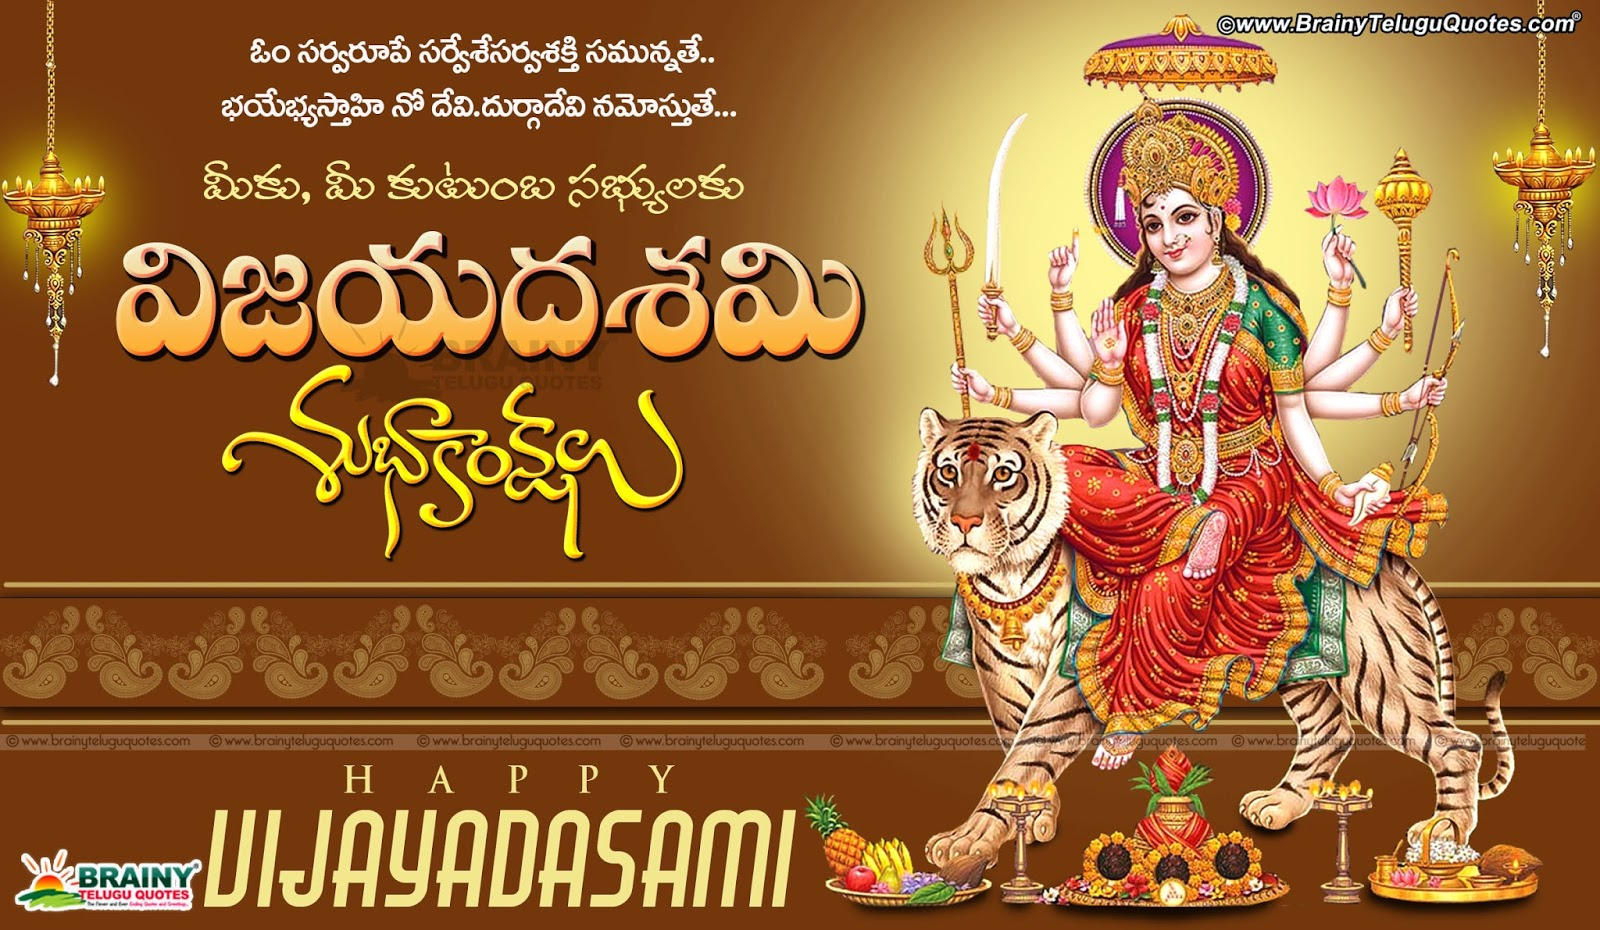 Vijayadahami Subhakankshalu in Telugu-Telugu Vijayadashami greetings-2016 Vijayadashami wishes quotes in Telugu